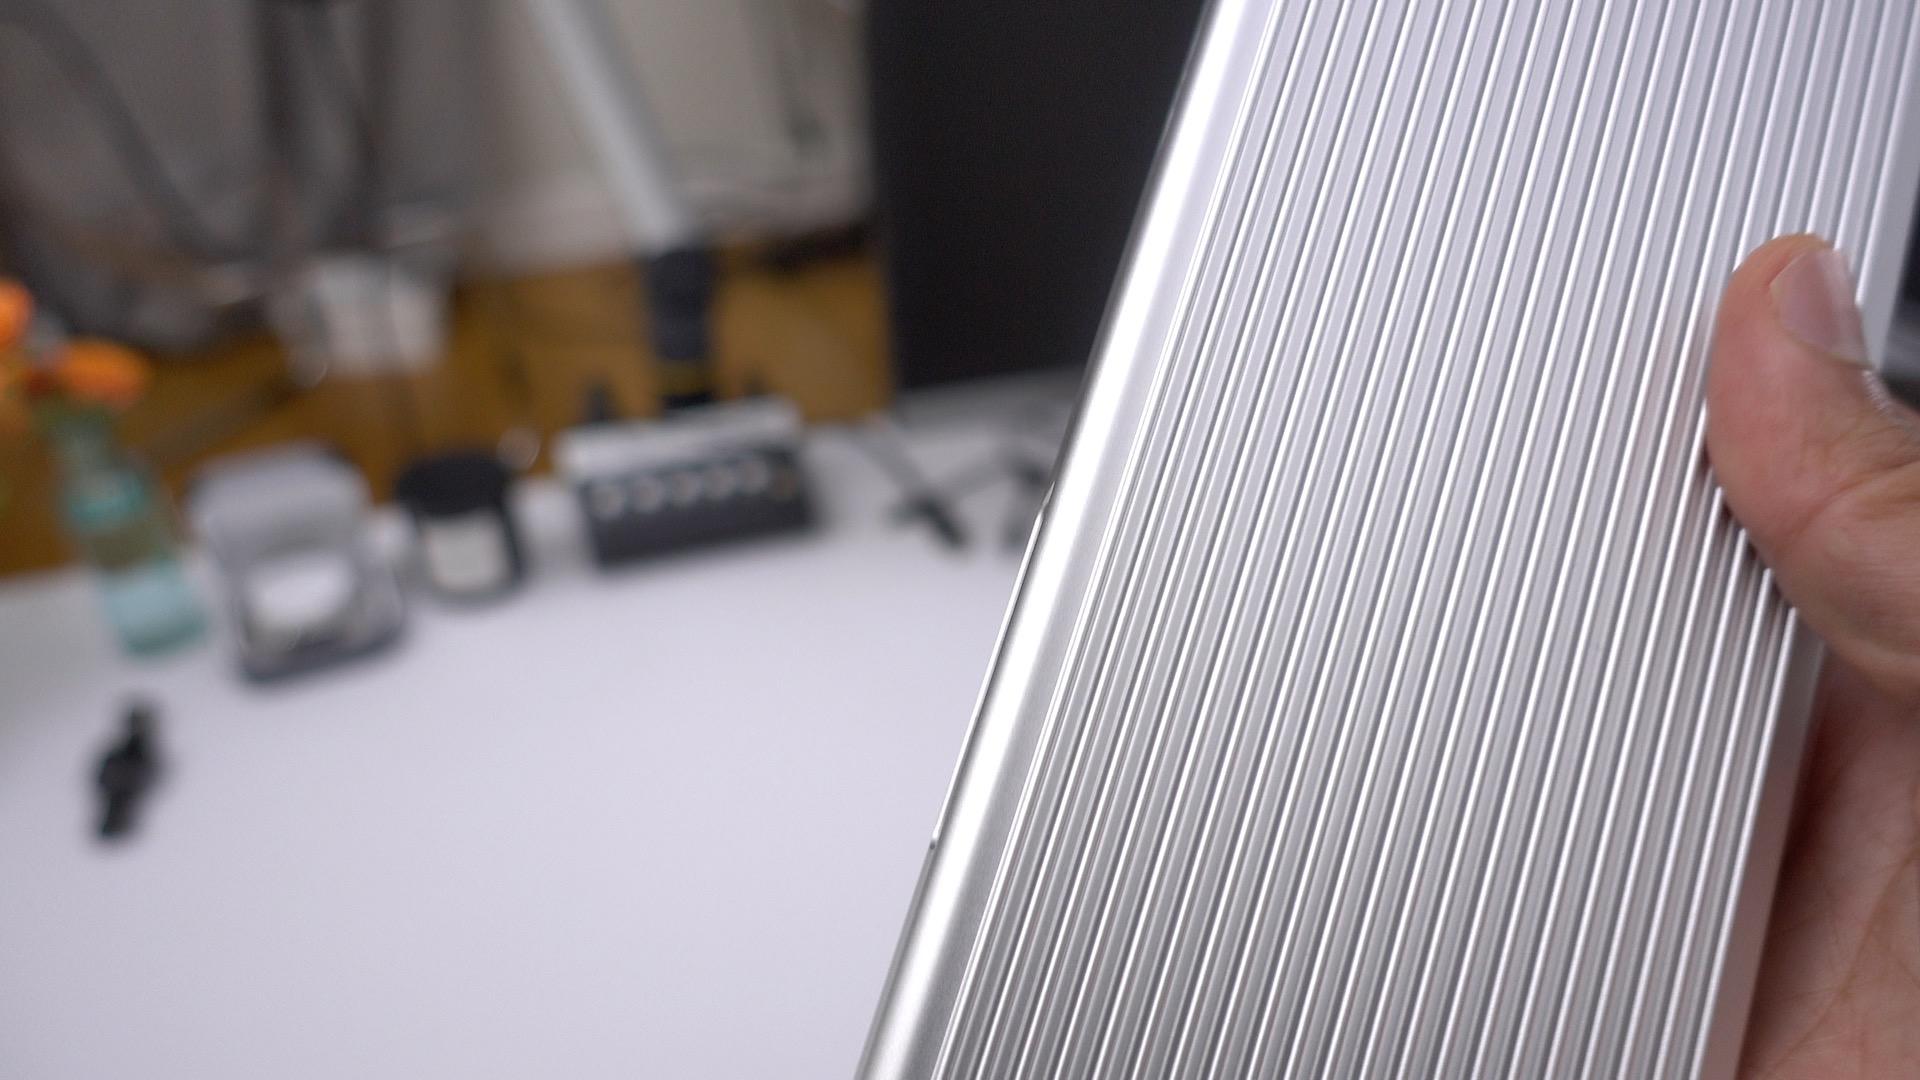 Review: CalDigit USB-C Dock - an okay solution for MacBook